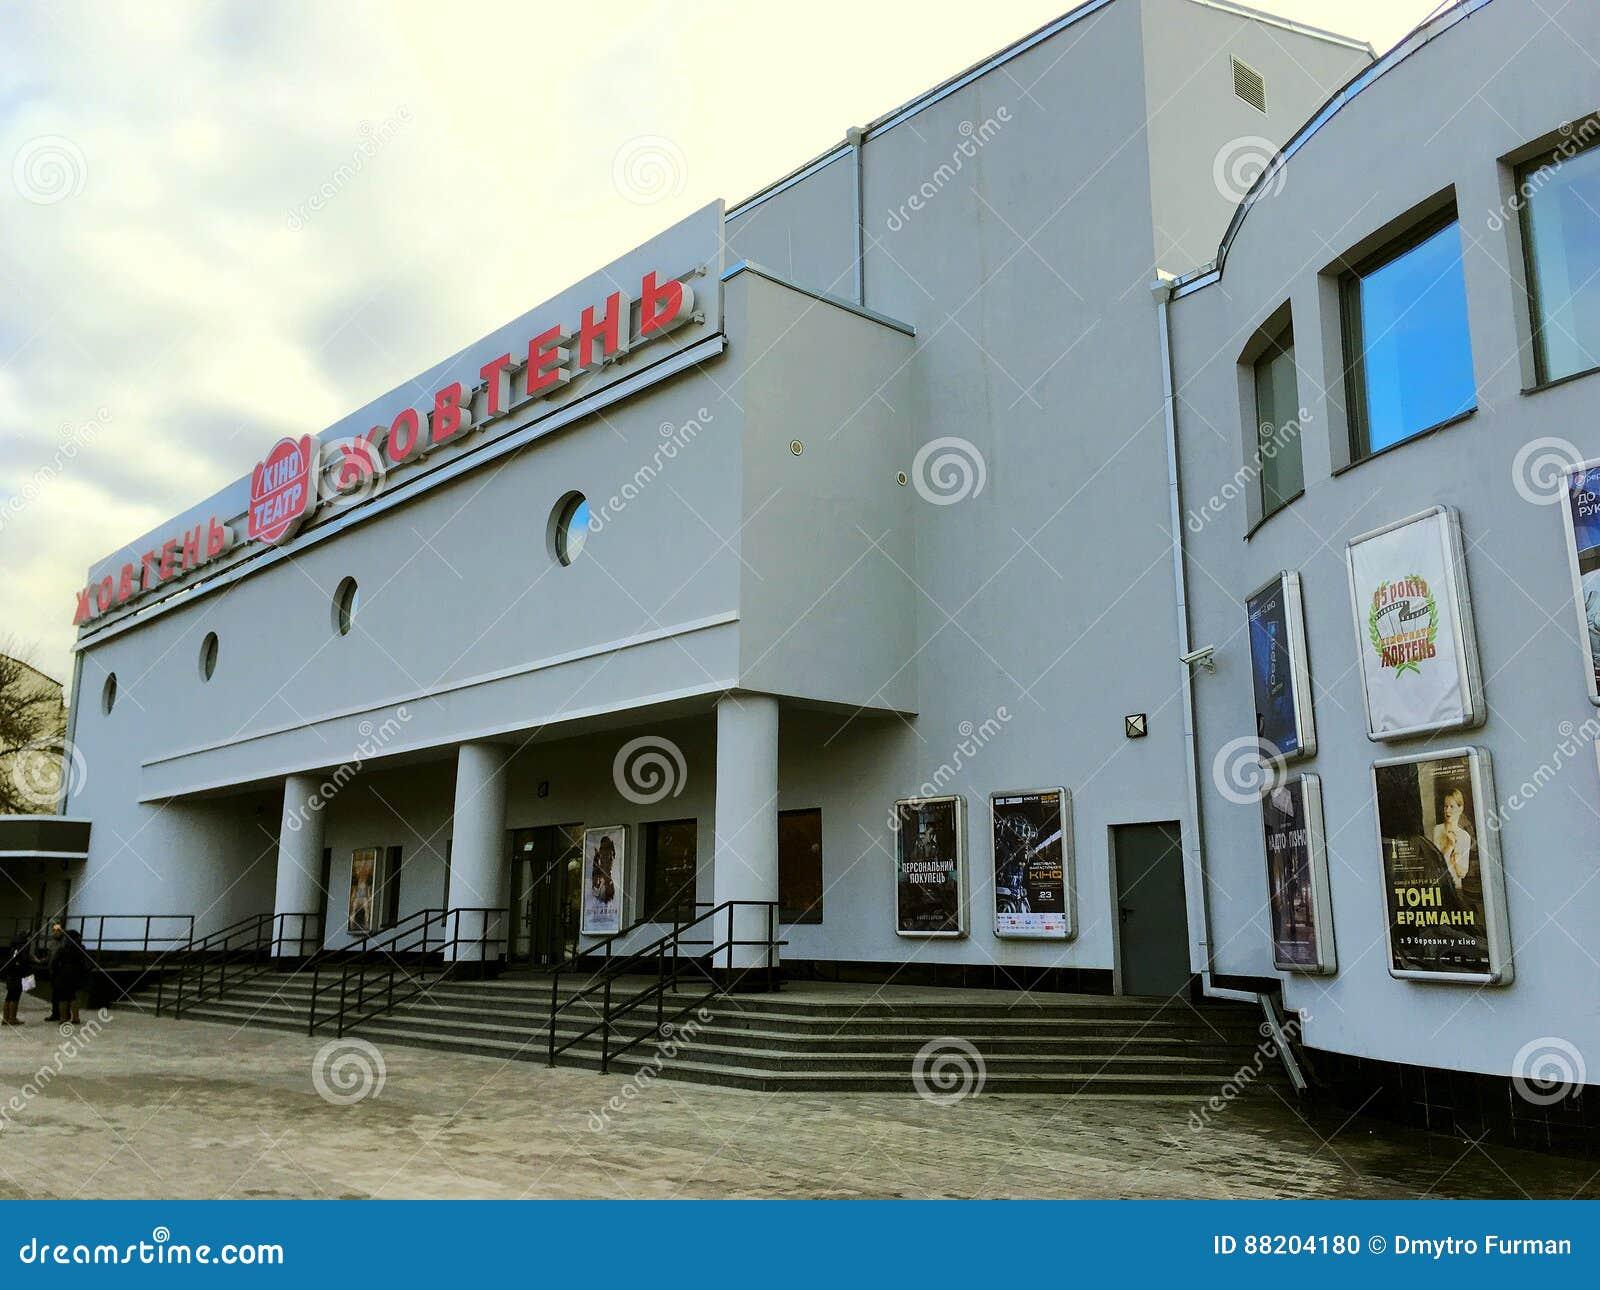 Cinemas of Ukraine: a selection of sites